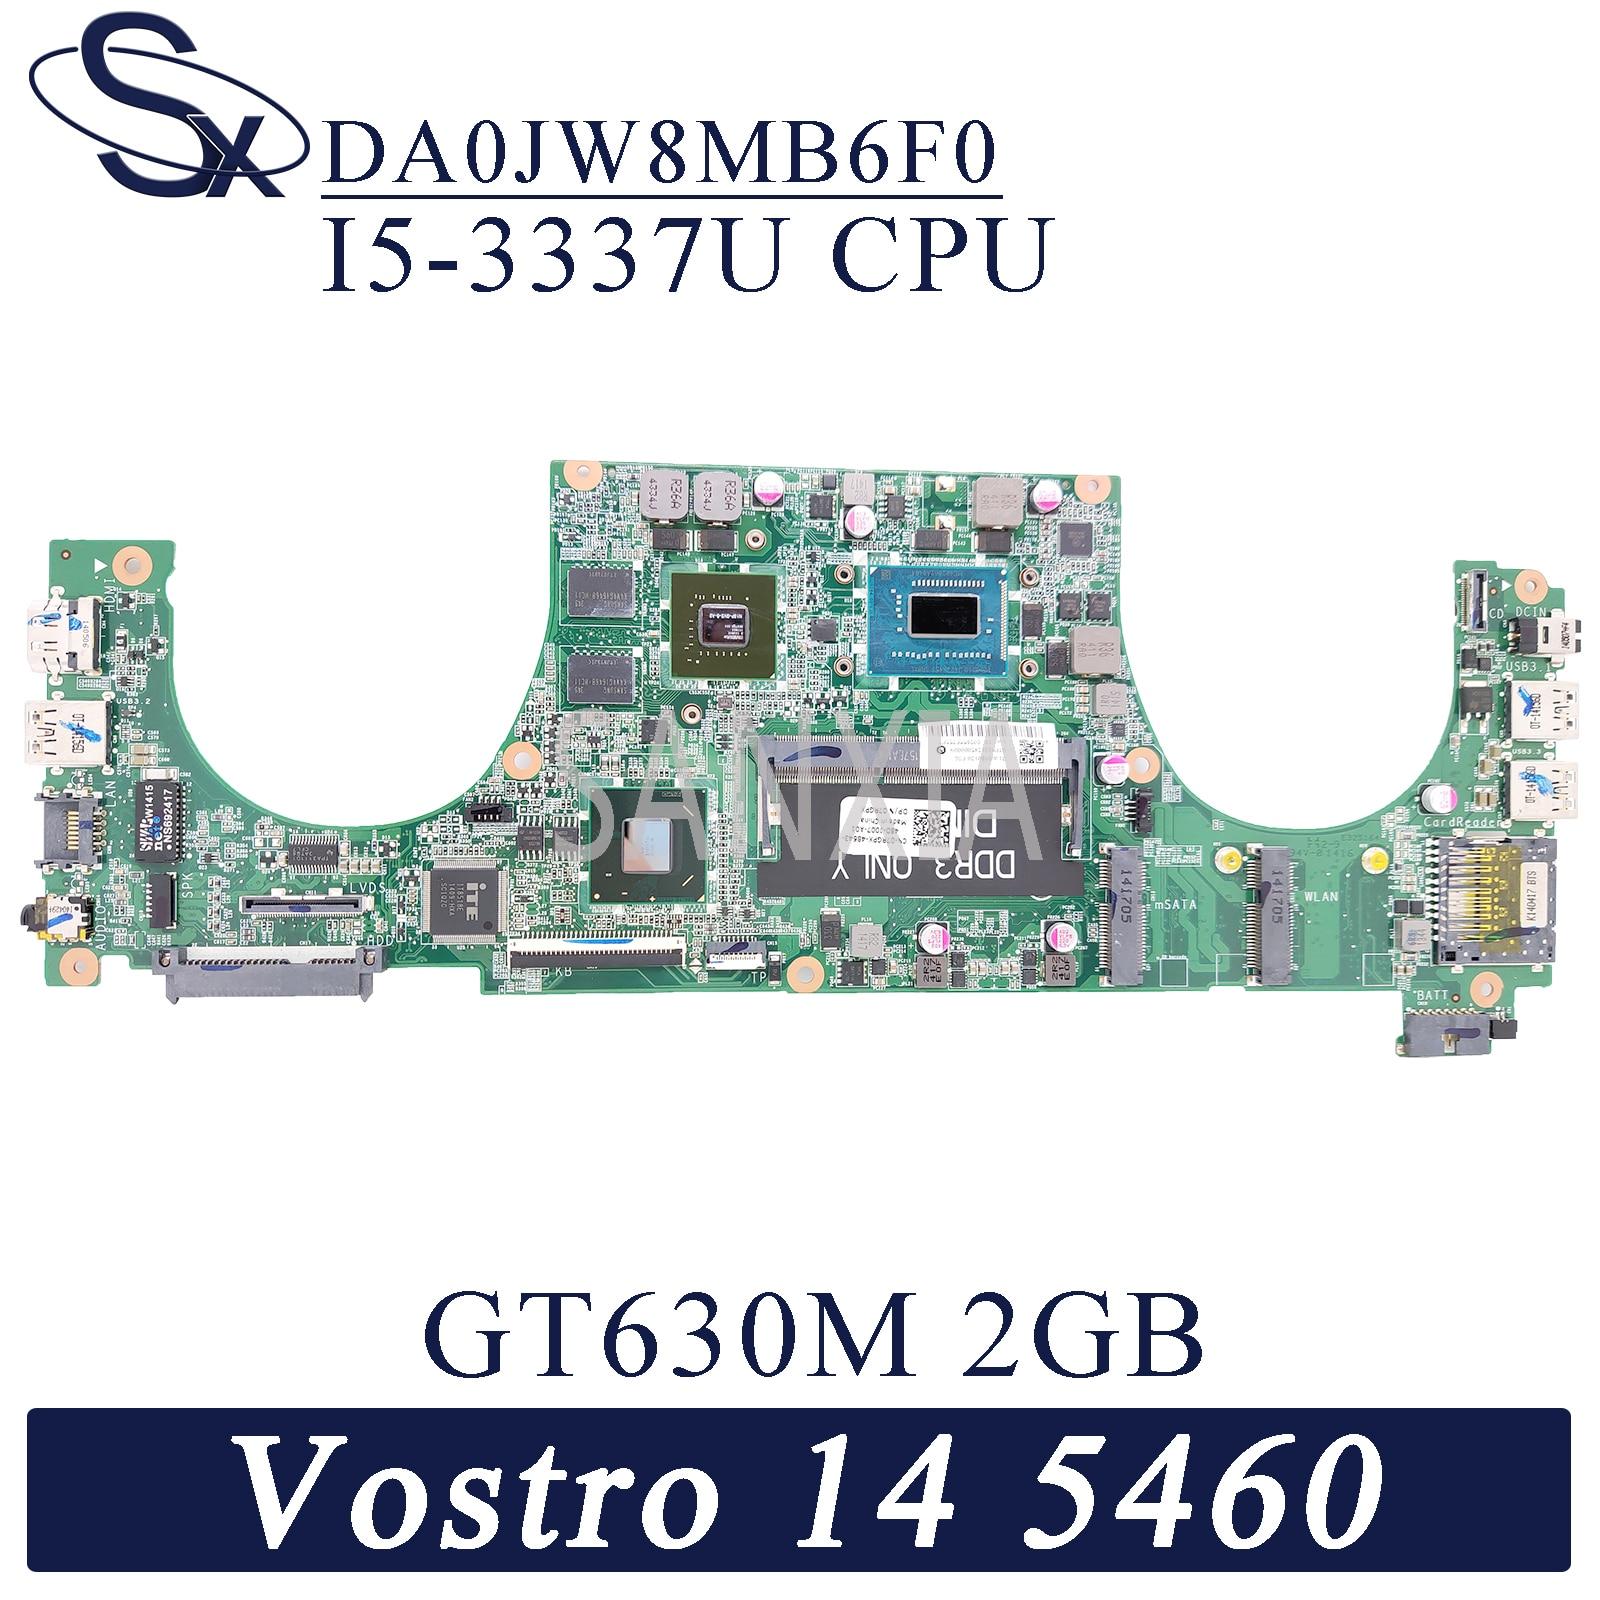 KEFU DA0JW8MB6F0 اللوحة الأم لأجهزة الكمبيوتر المحمول ديل Vostro 5460 الأصلي I5-3337UM GT630M-2GB